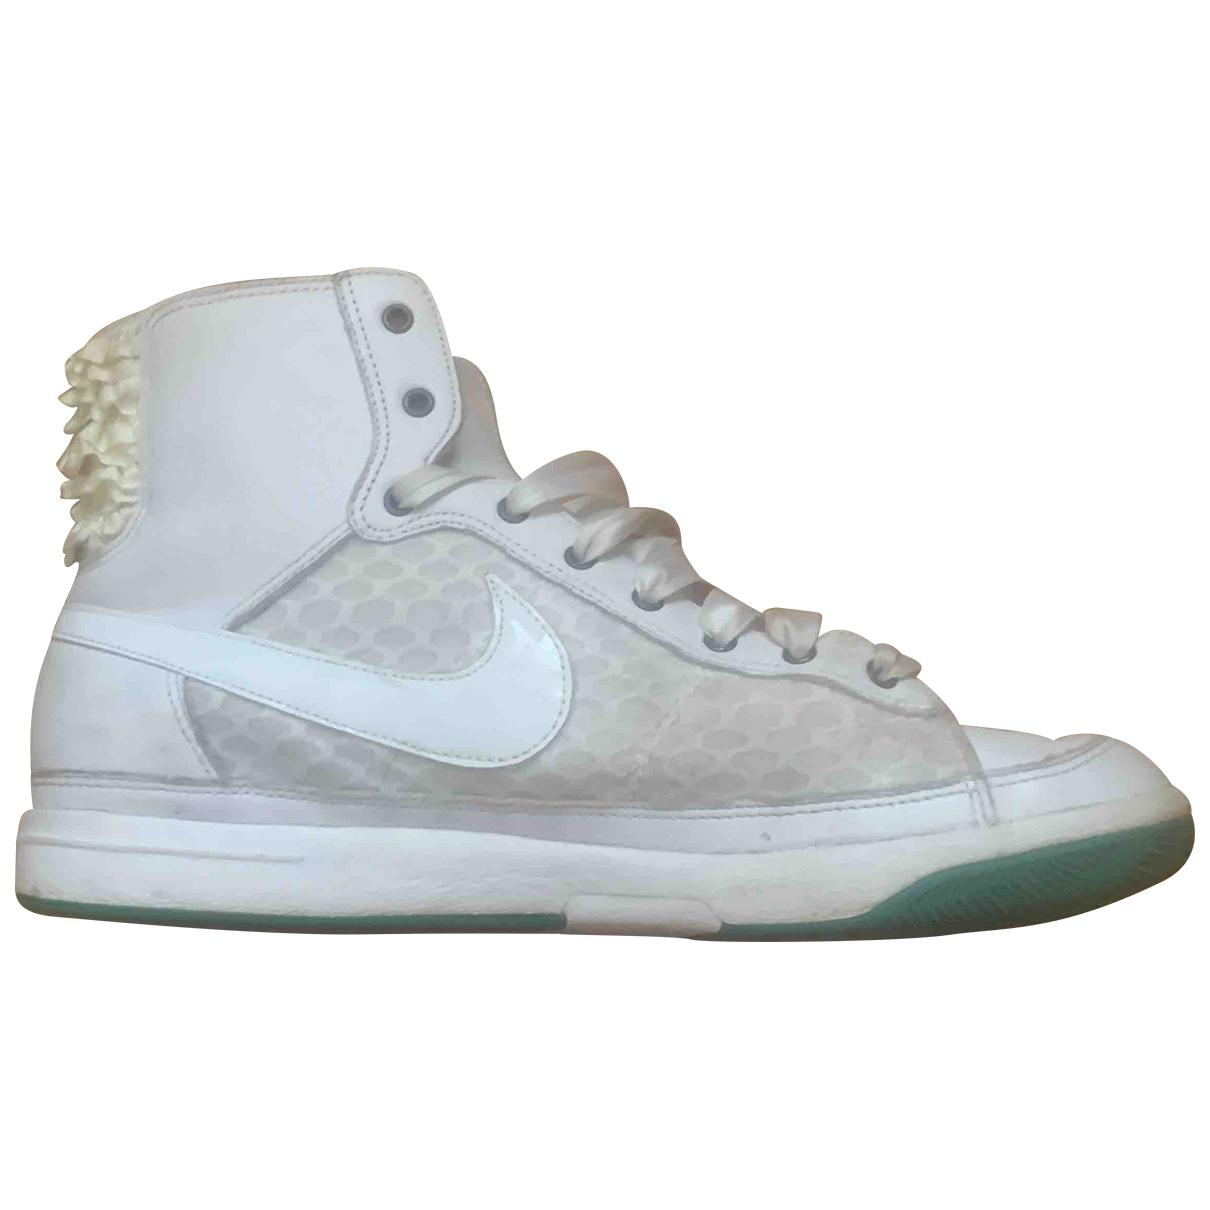 Nike Blazer Sneakers in  Weiss Kautschuk